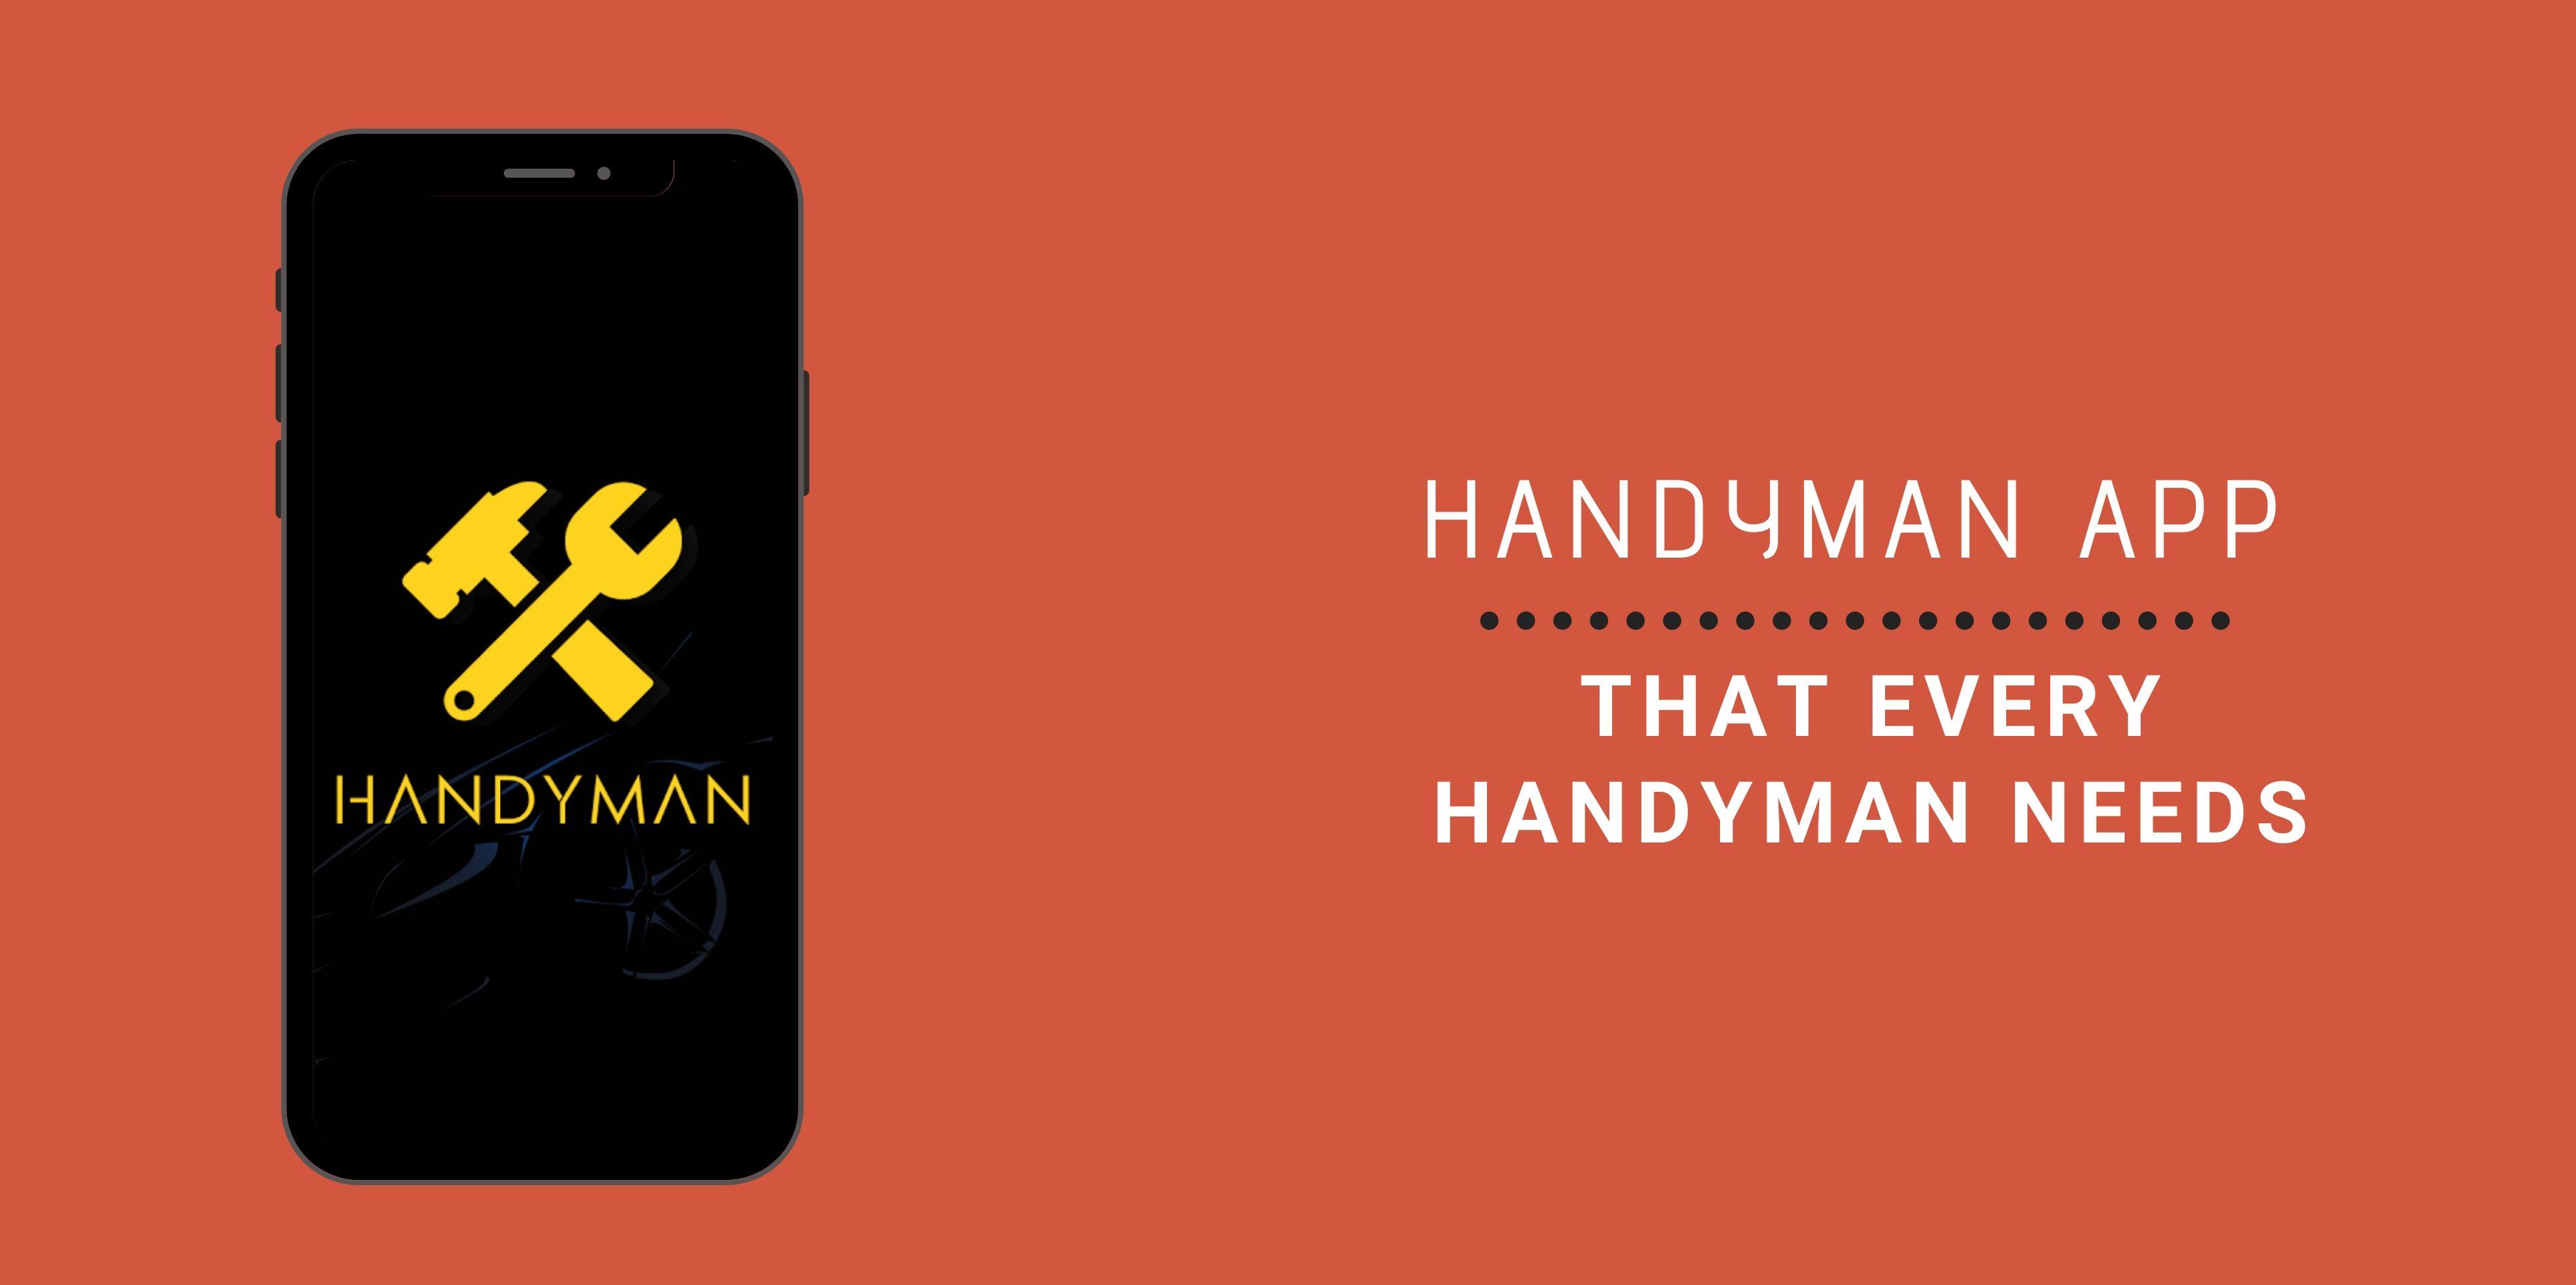 10 handyman app that every handyman needs